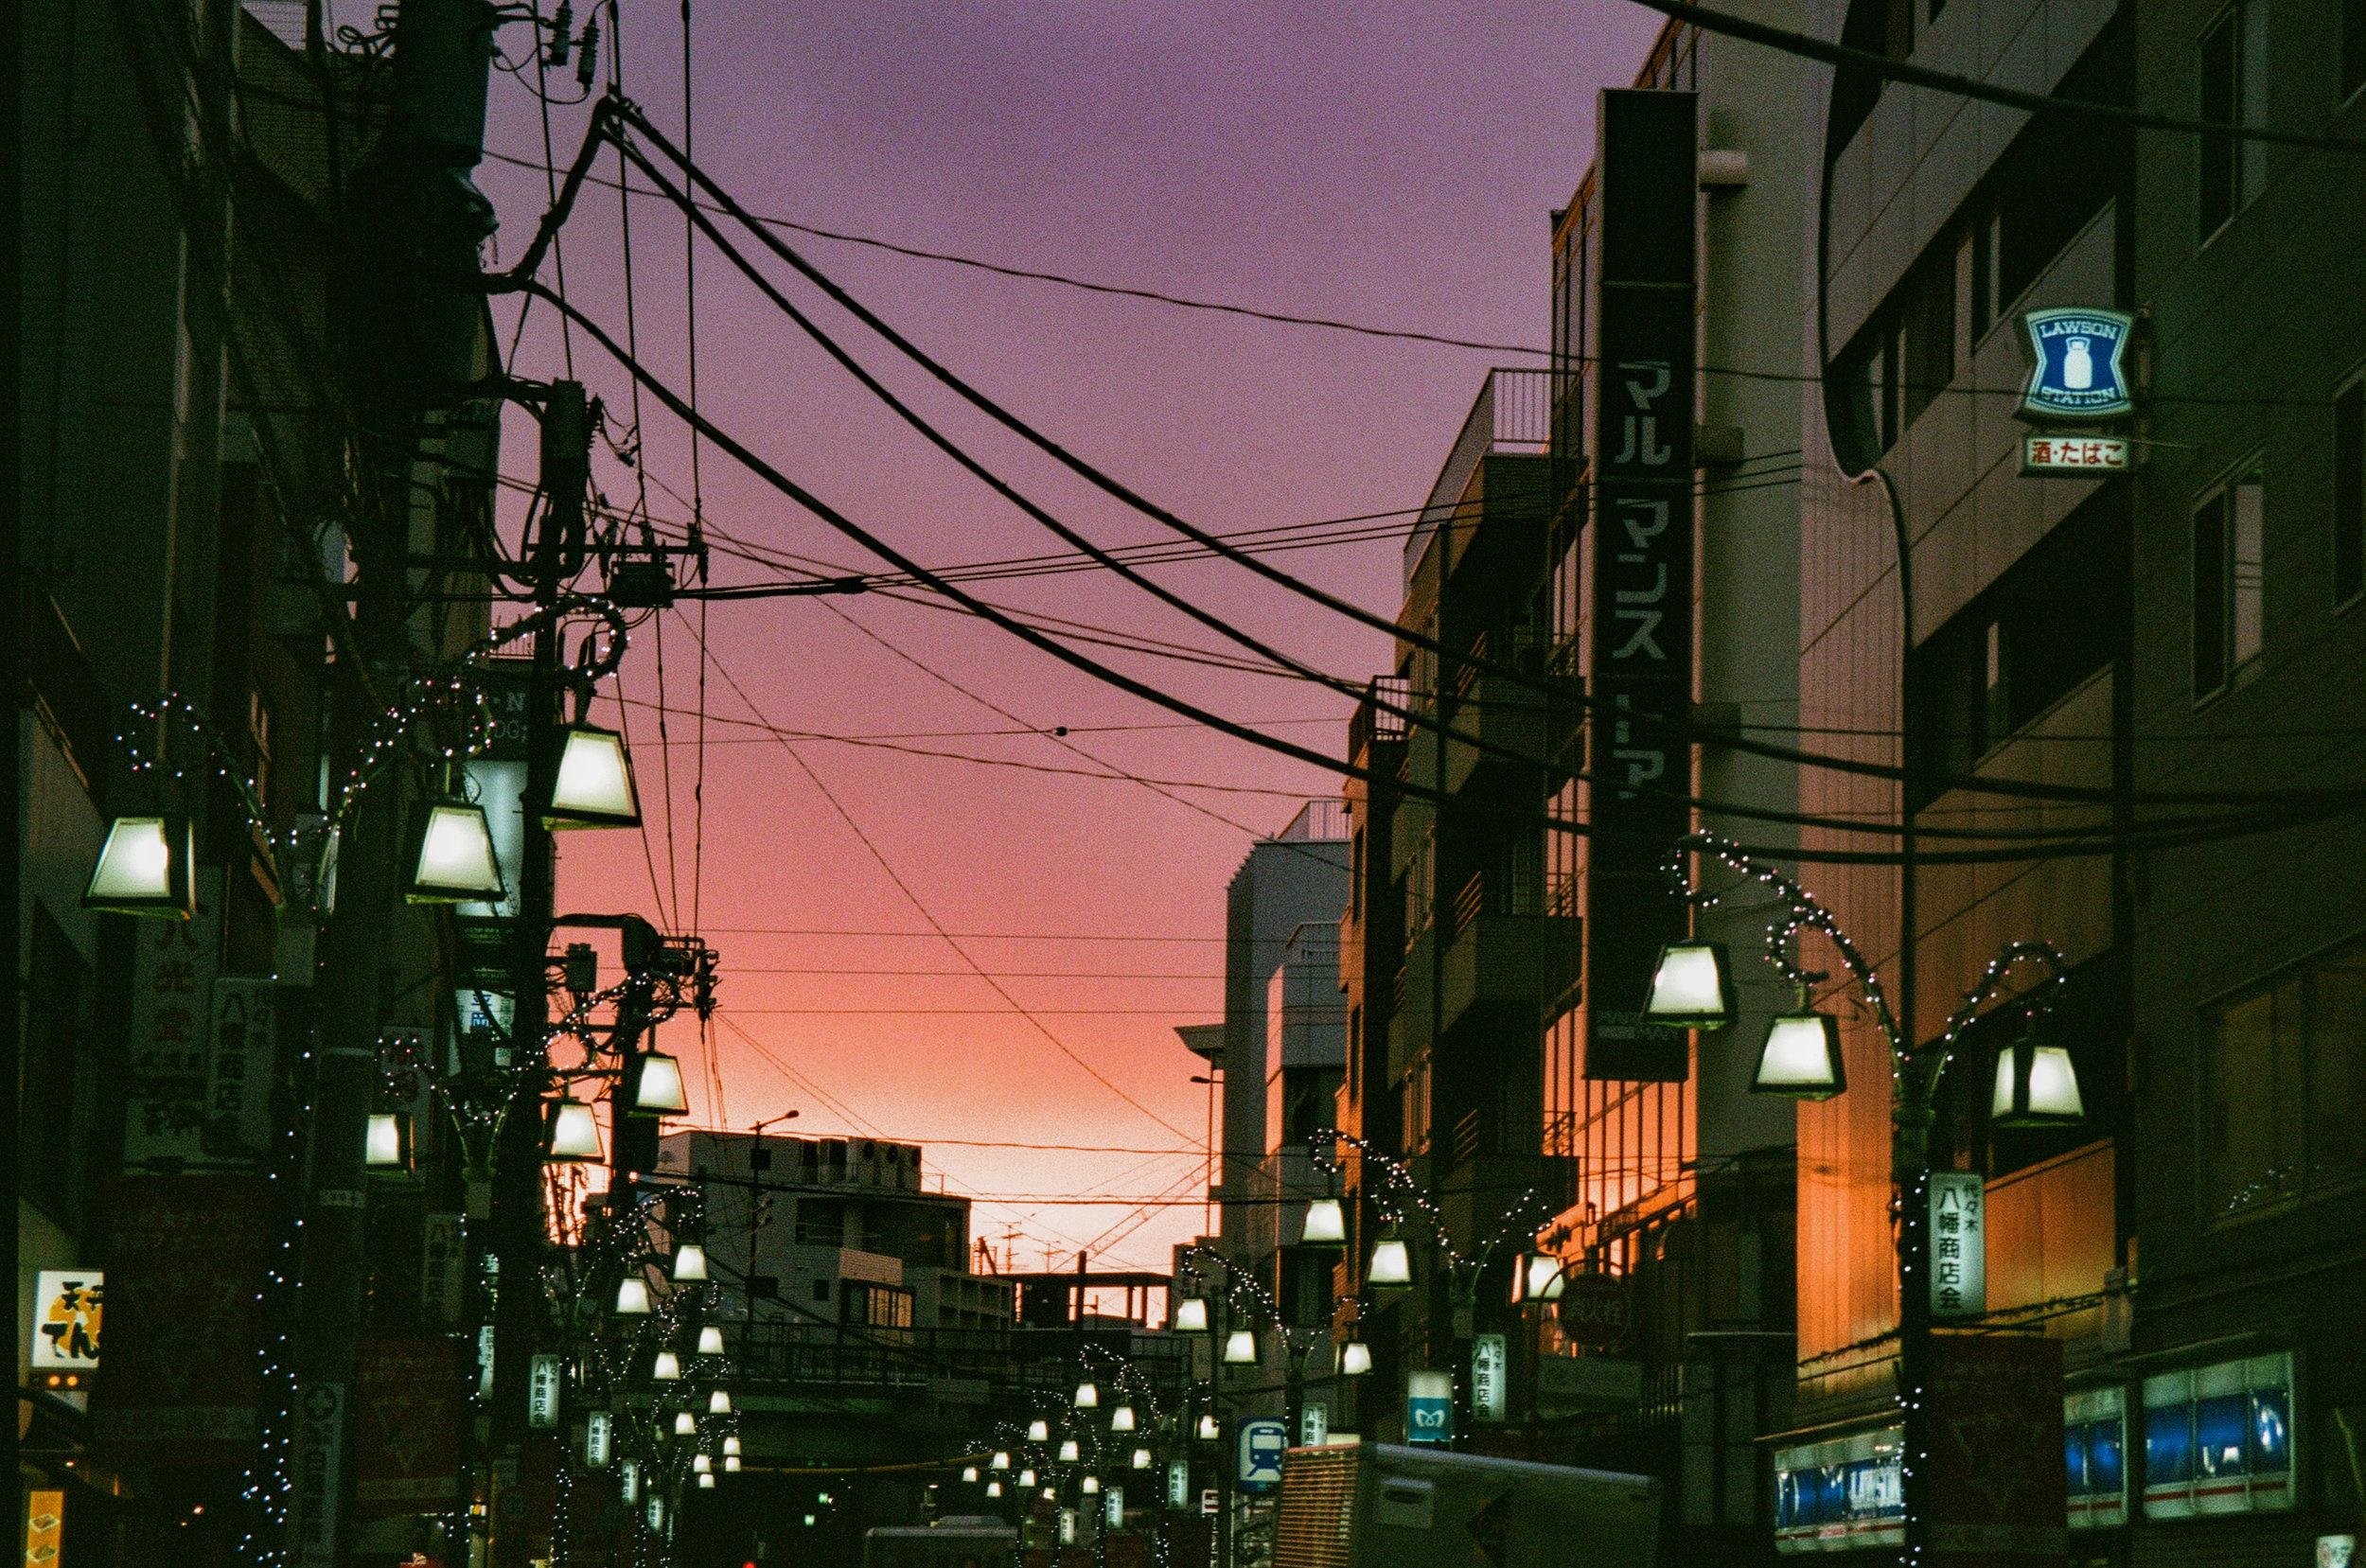 Japan_35mm-74.jpg